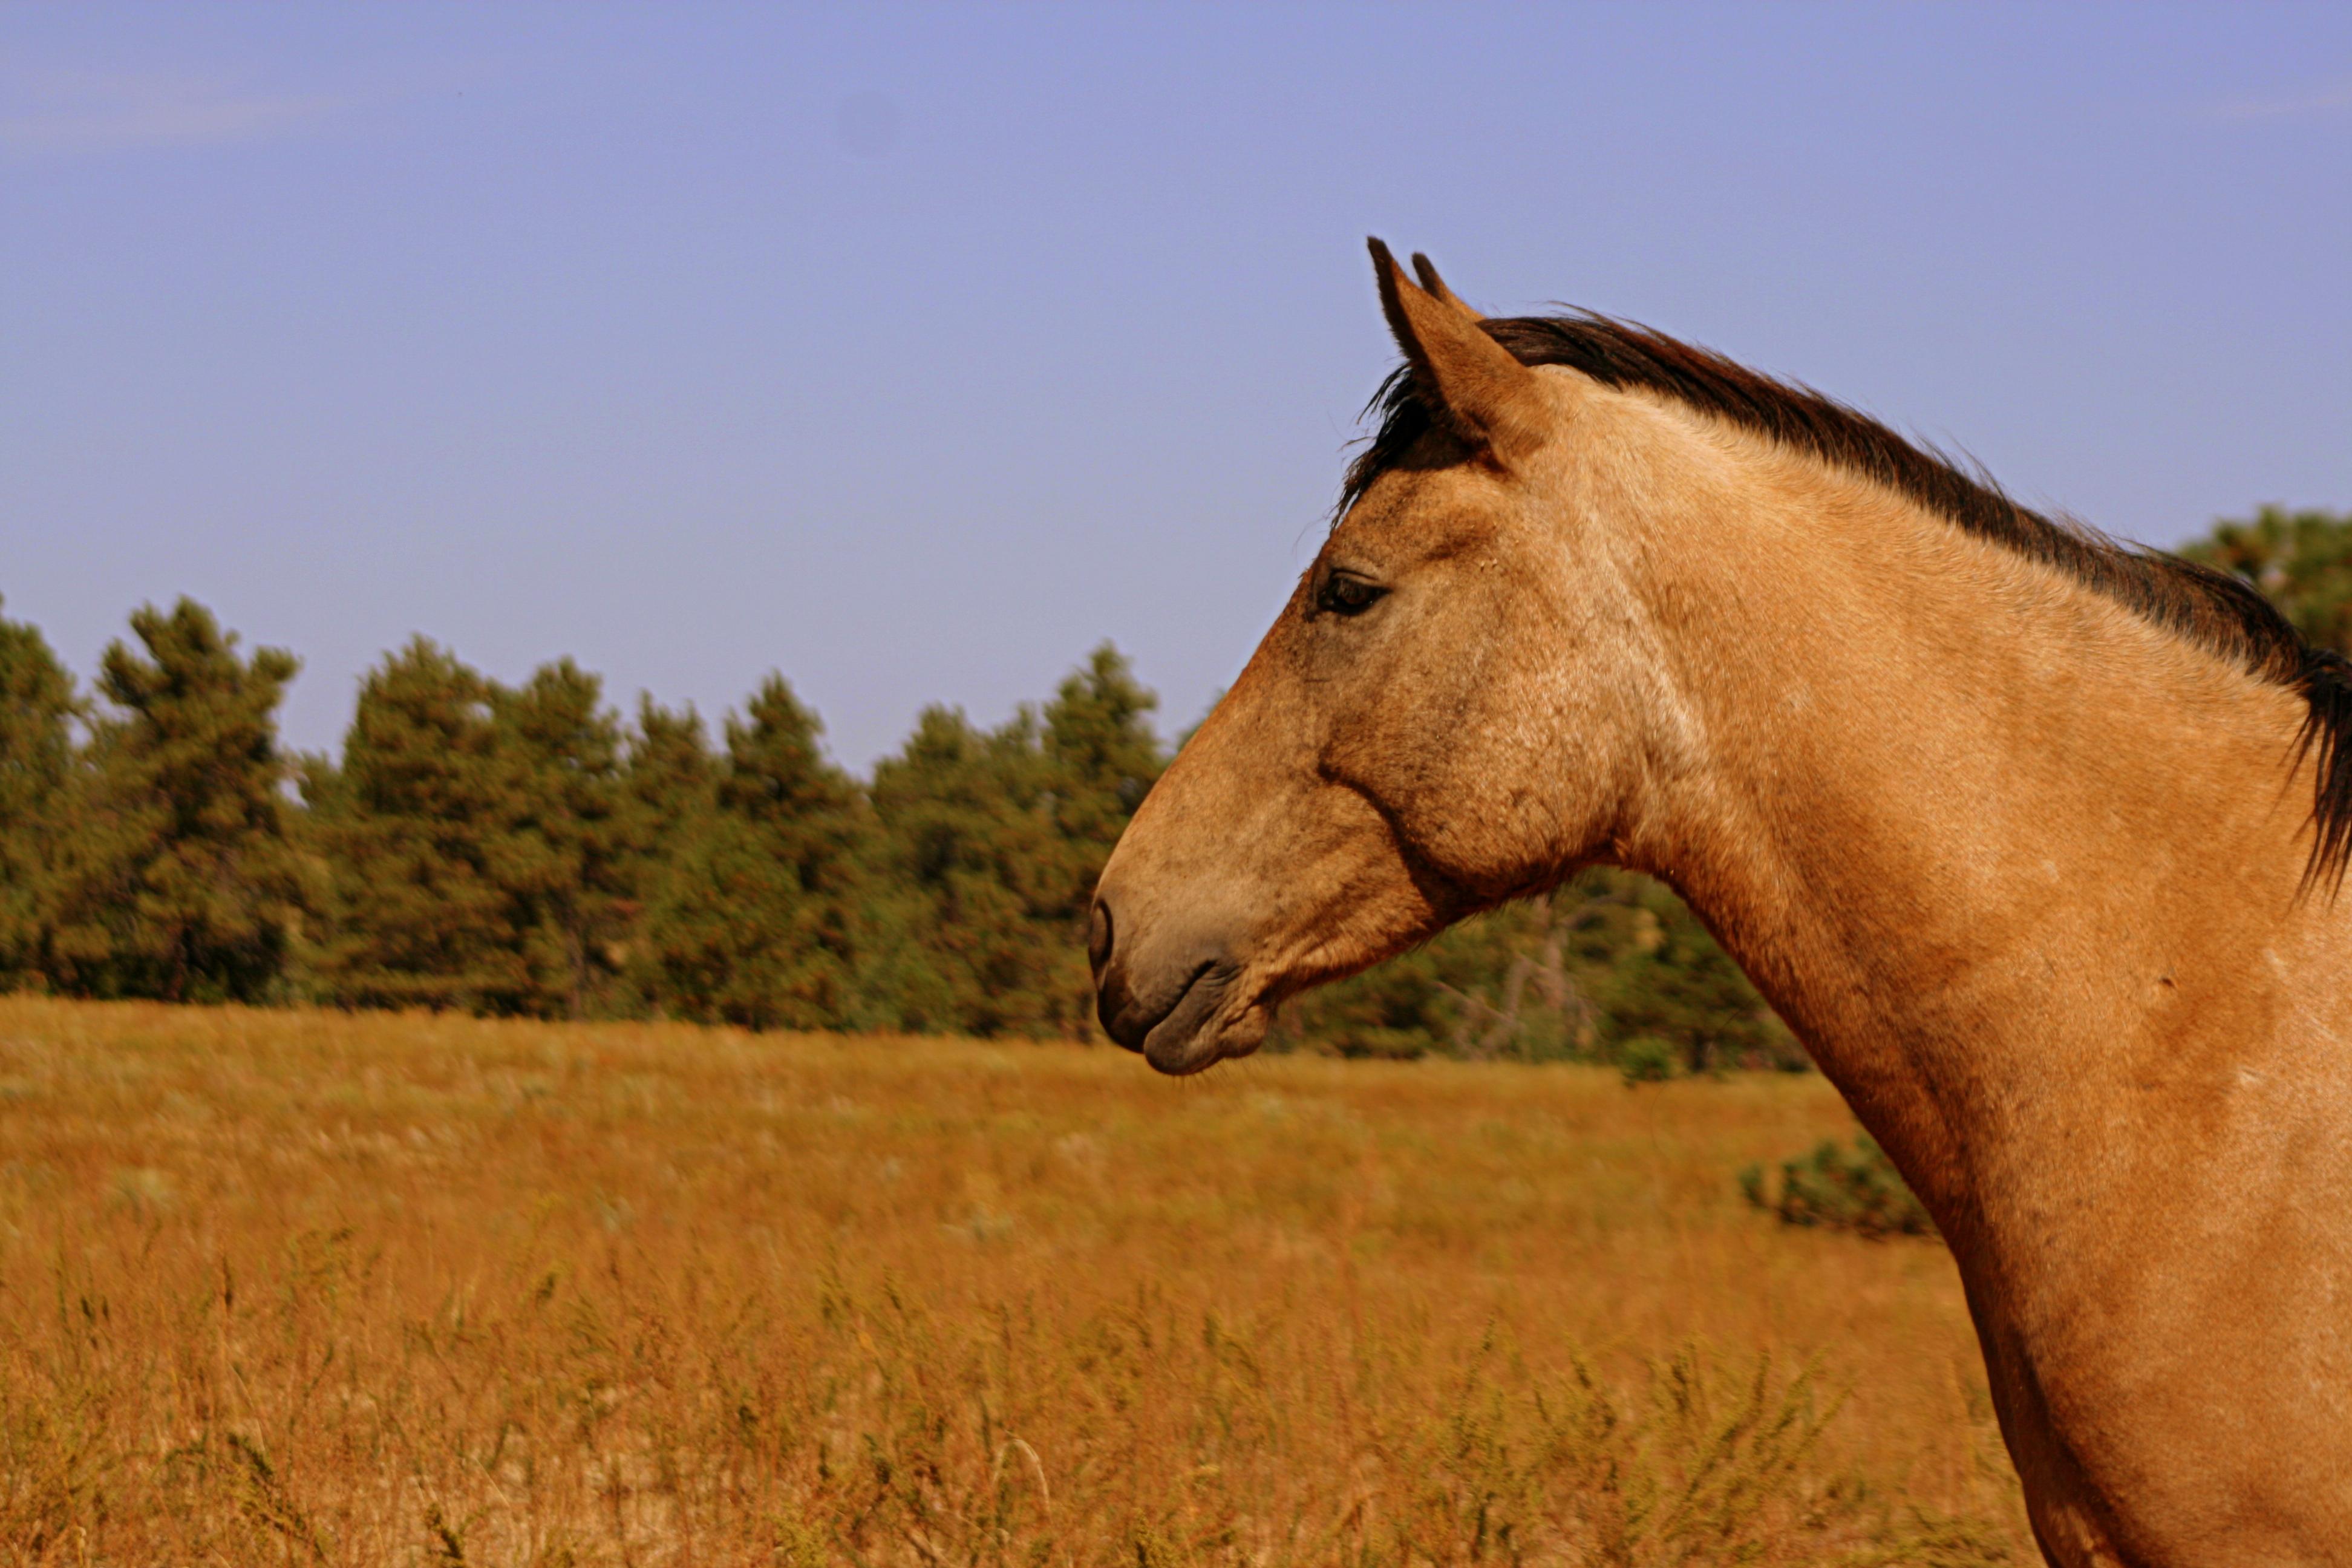 wildbuckskinhorse